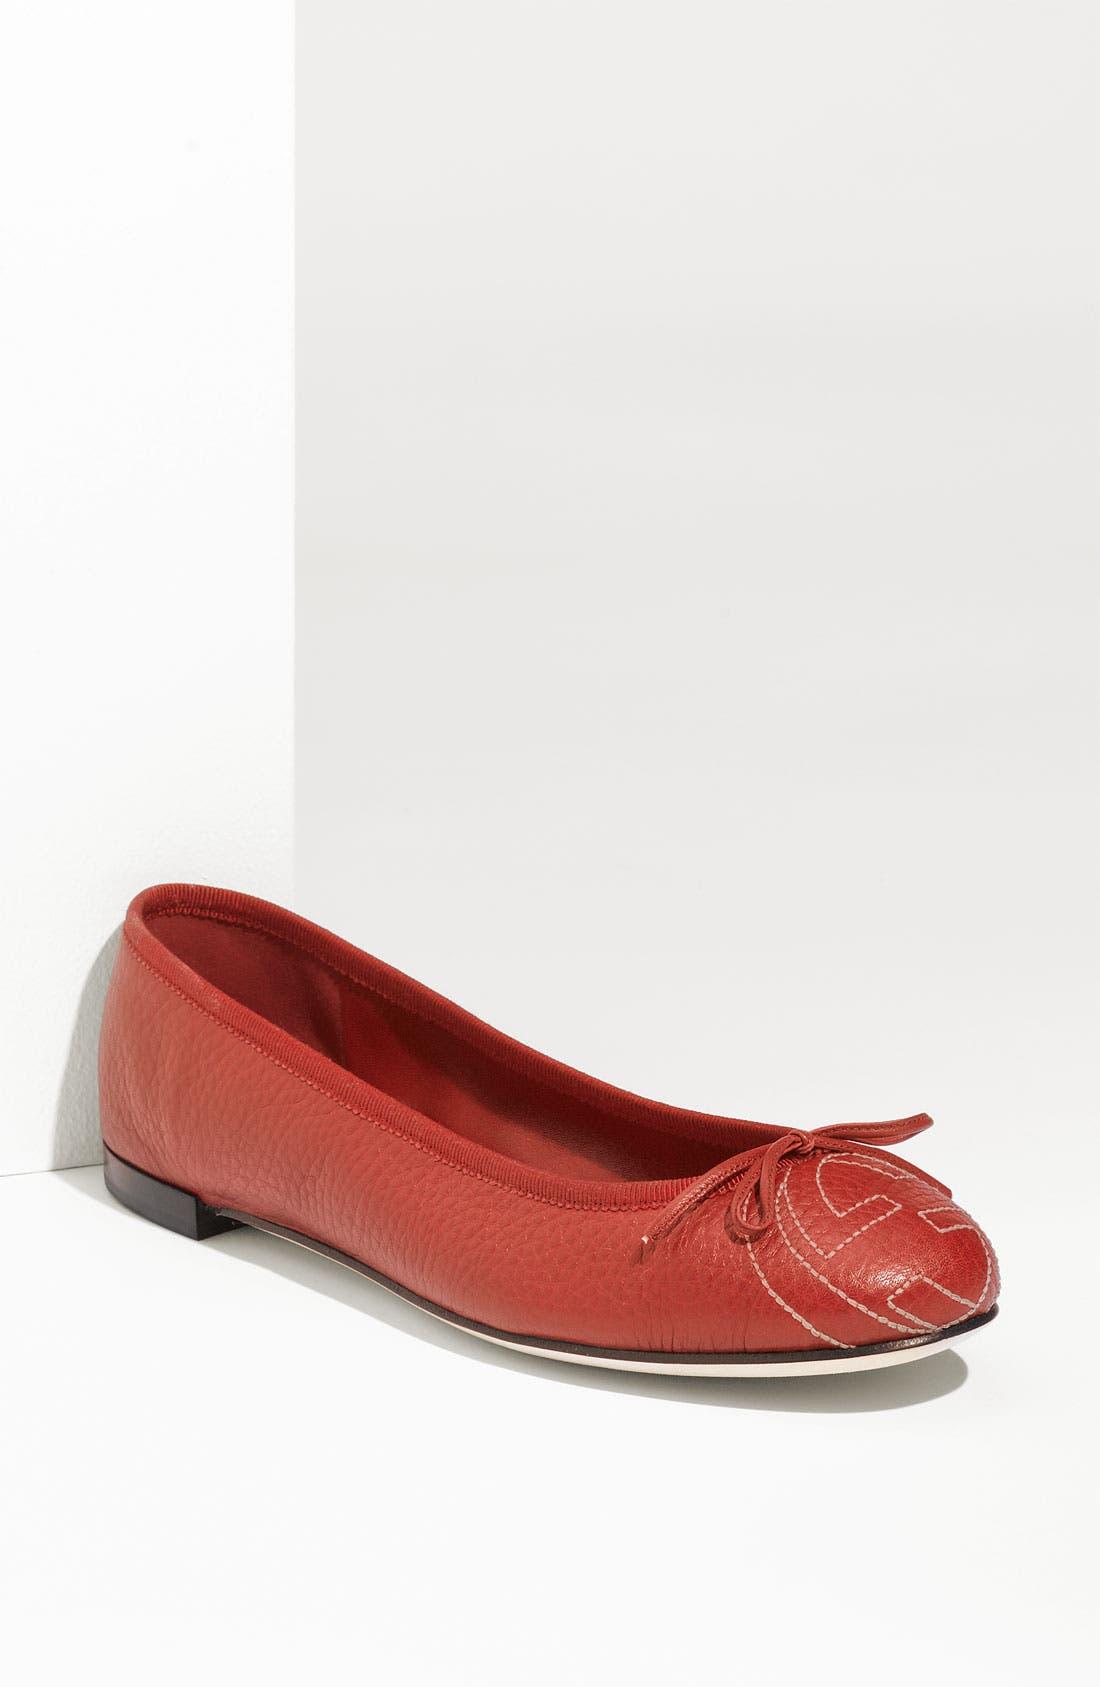 Main Image - Gucci 'Soho' Ballerina Flat